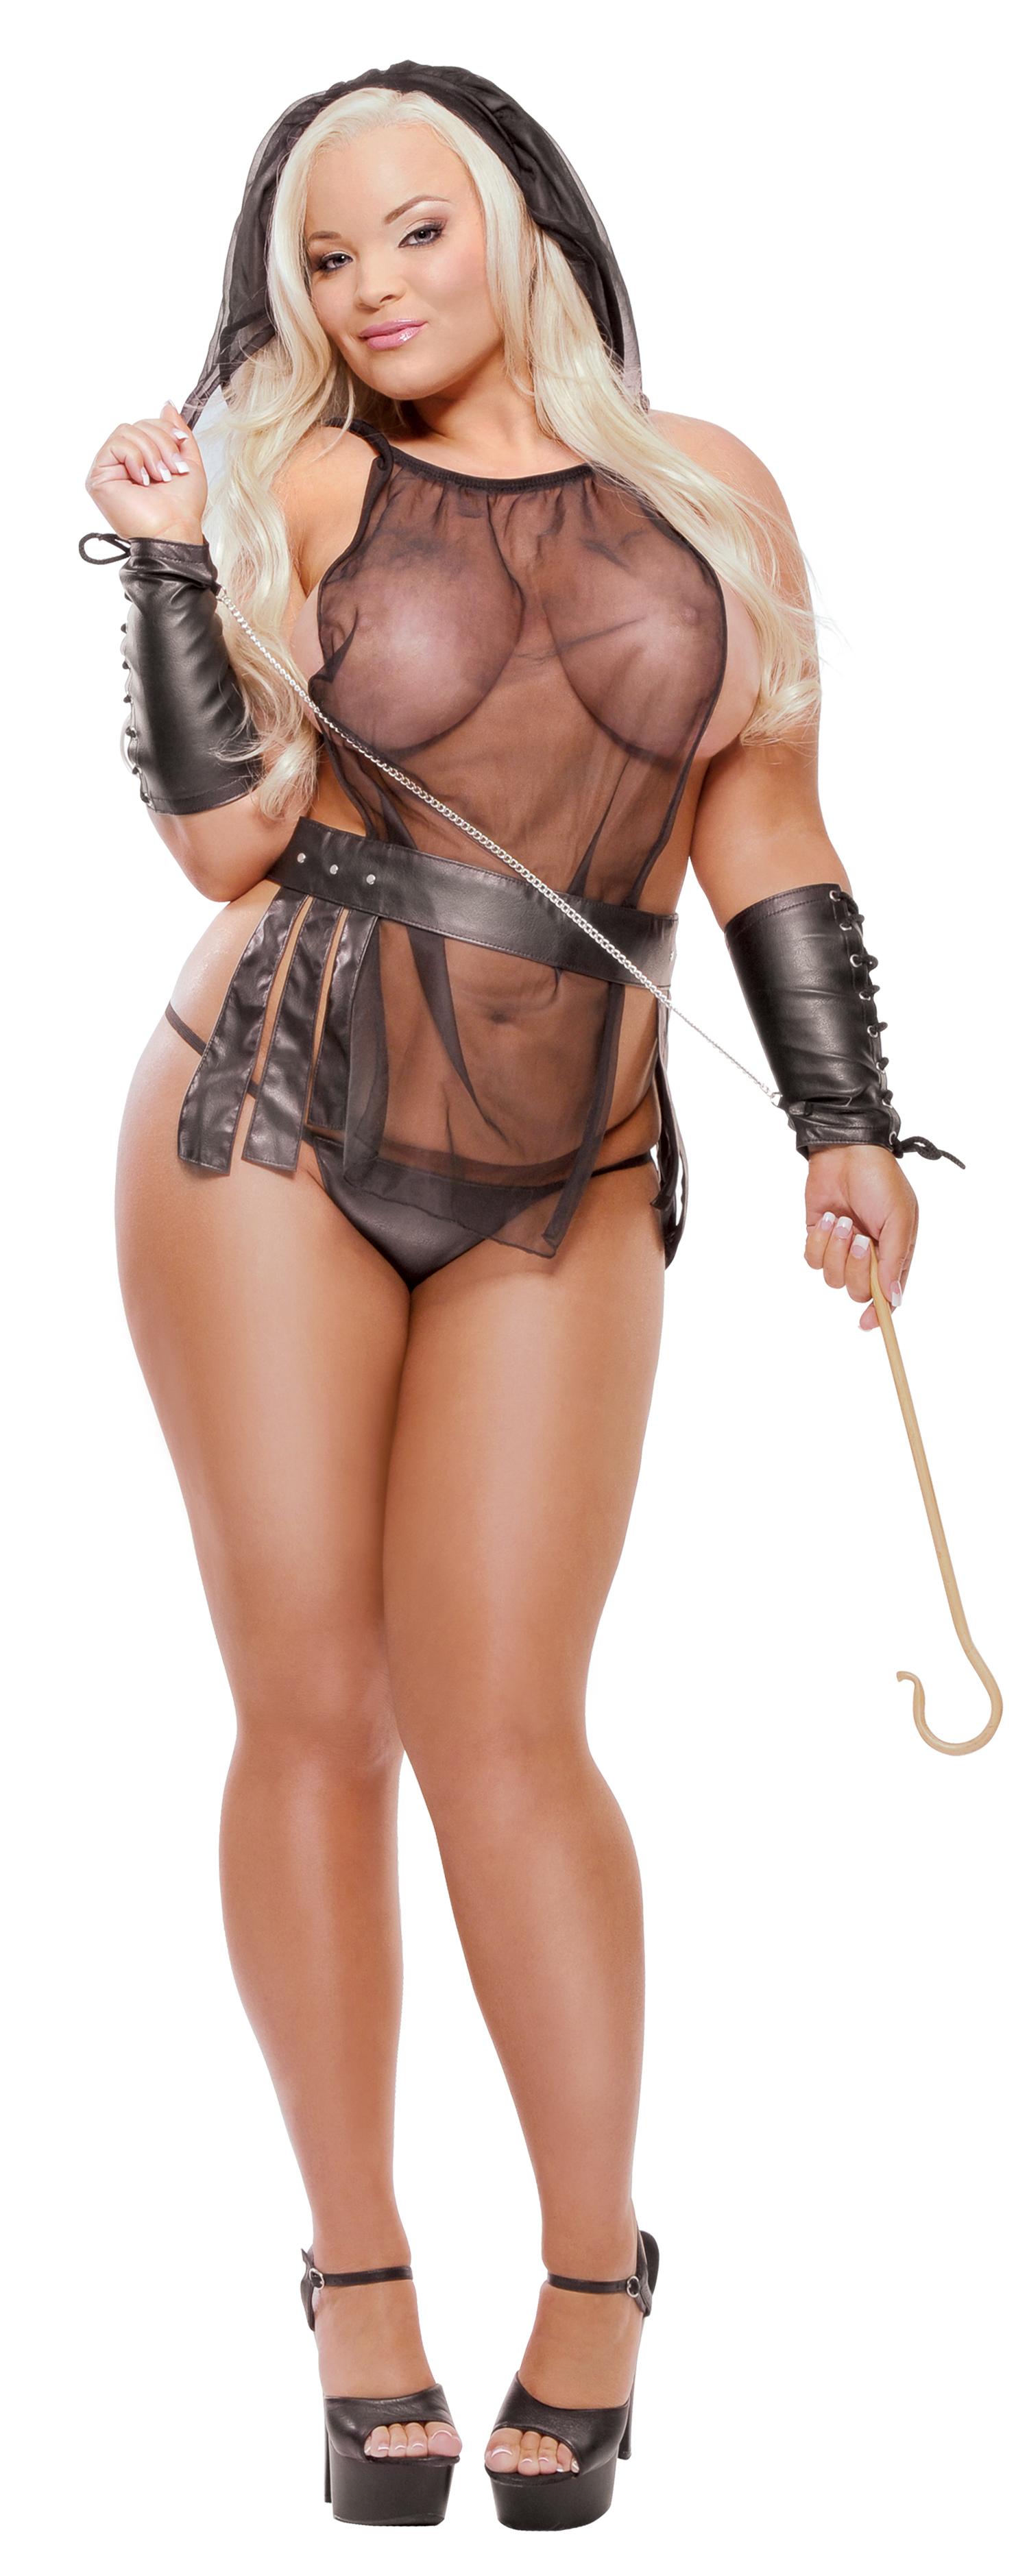 Trisha Paytas Sexy and Nude (111 pics 4 videos) - Sexy ...